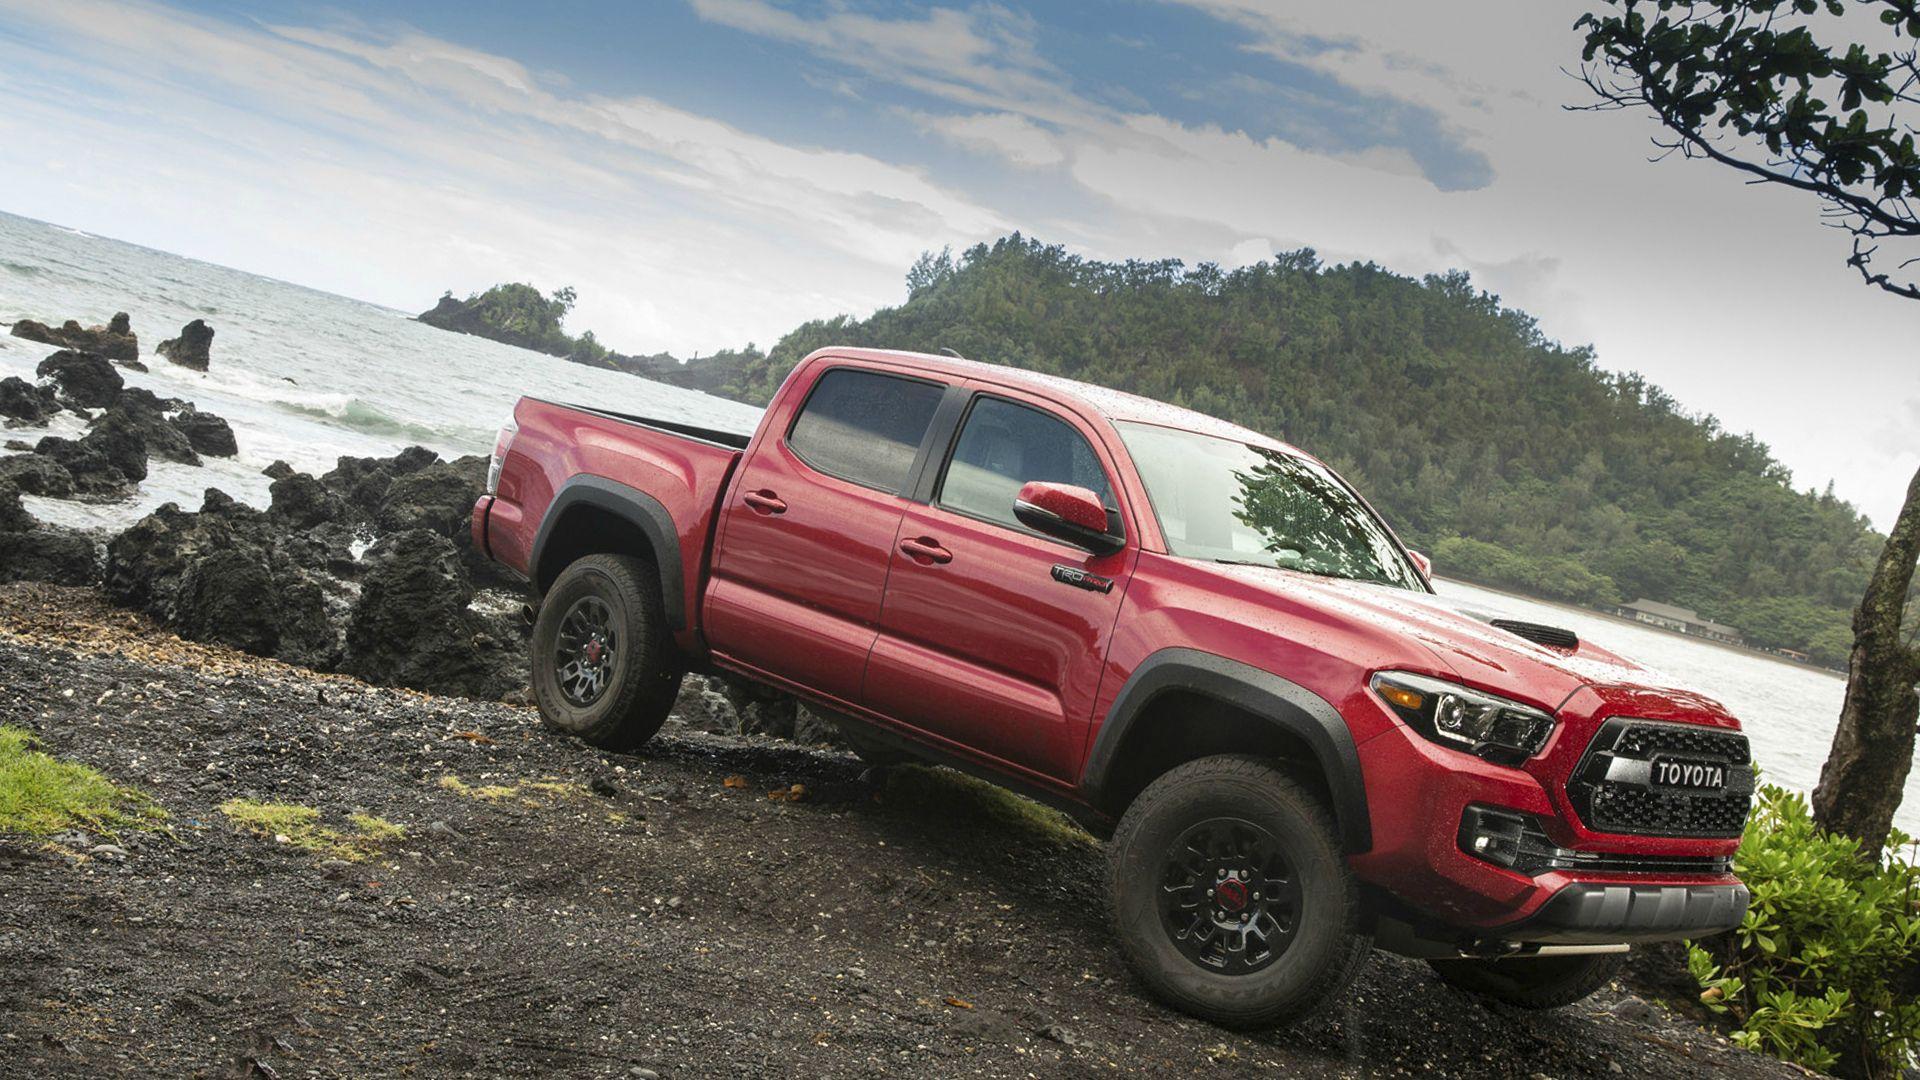 New 2019 Toyota Tacoma Wallpaper Hd Desktop Toyota Of Riverside